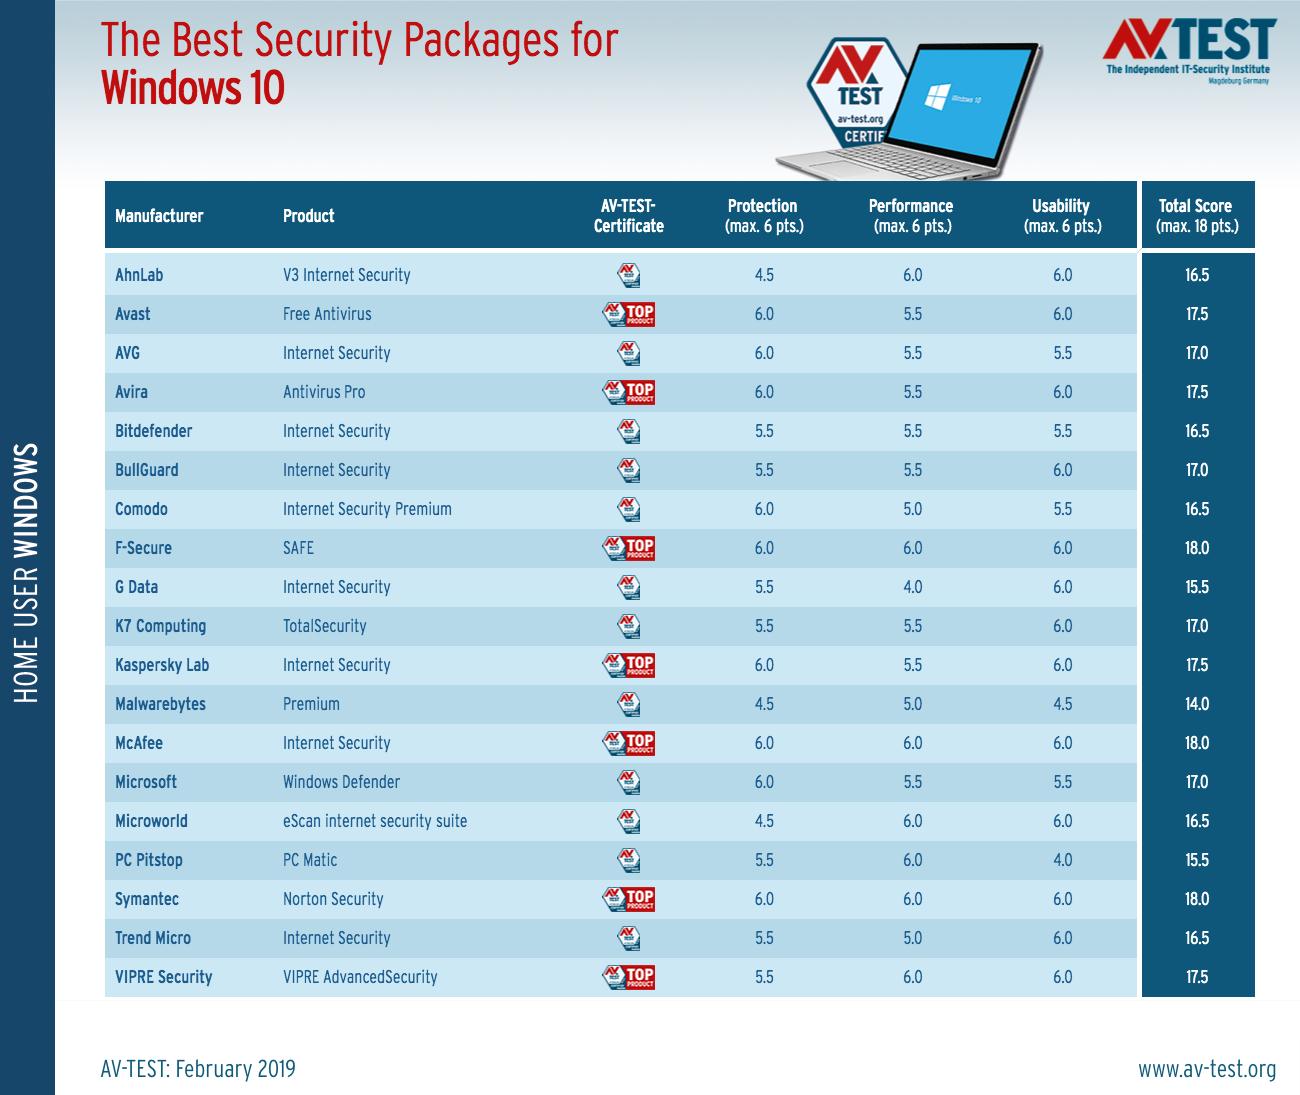 AV-TEST评选适用于家庭用户的最佳Win10防病毒软件的照片 - 2